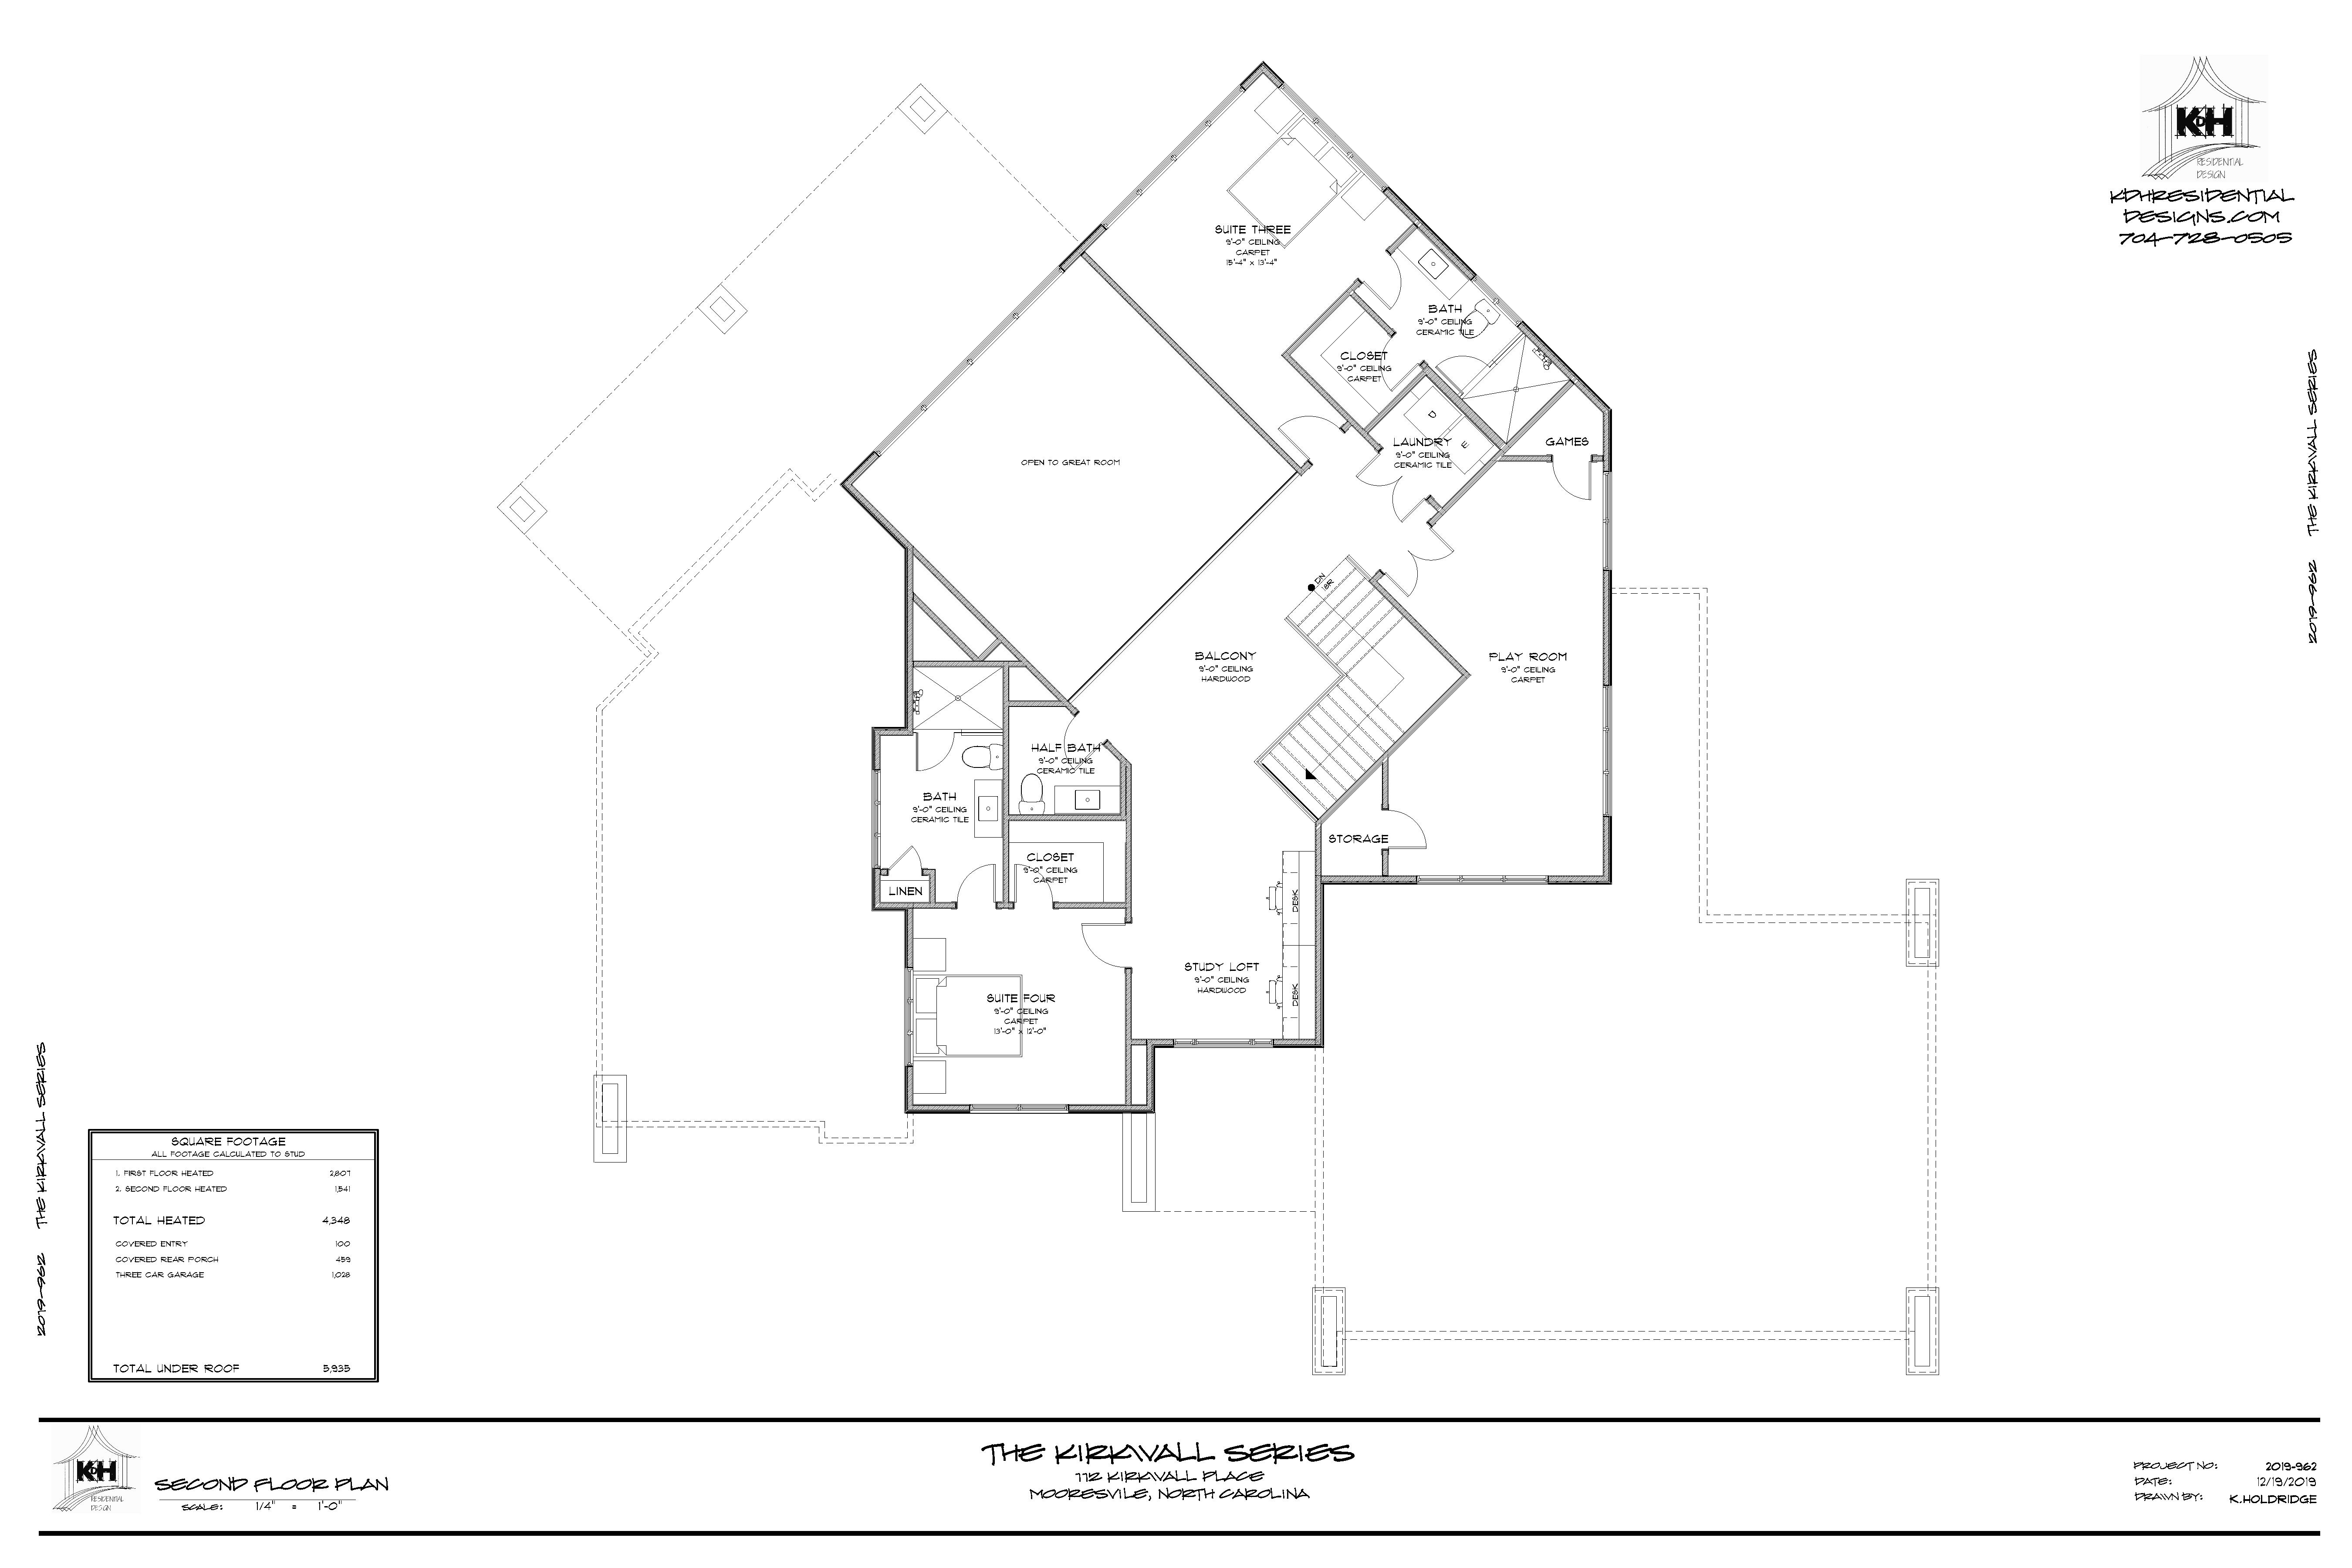 Proposed Floor Plan (Upper Level)